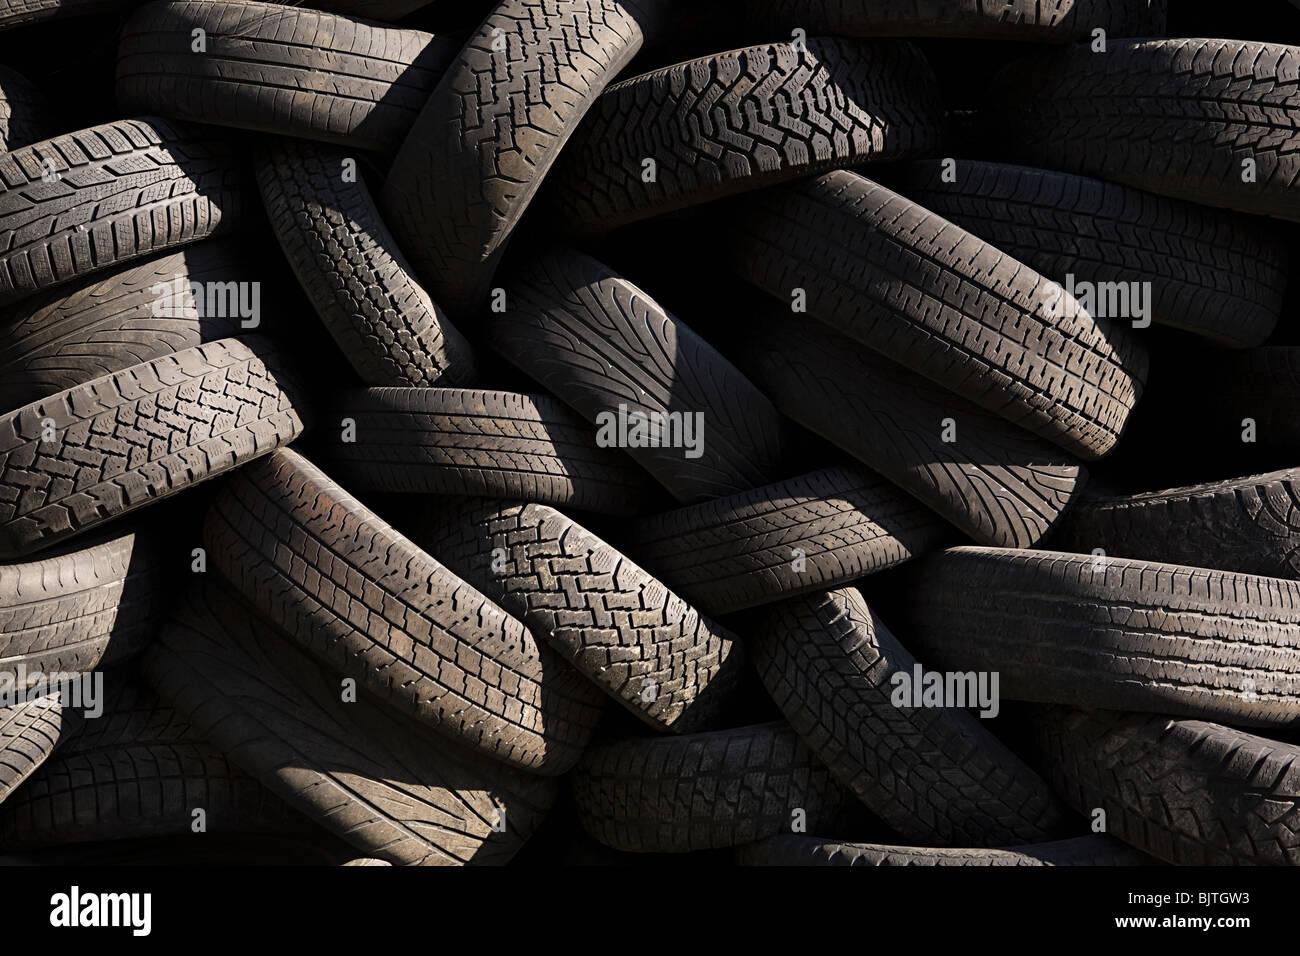 Tyres - Stock Image